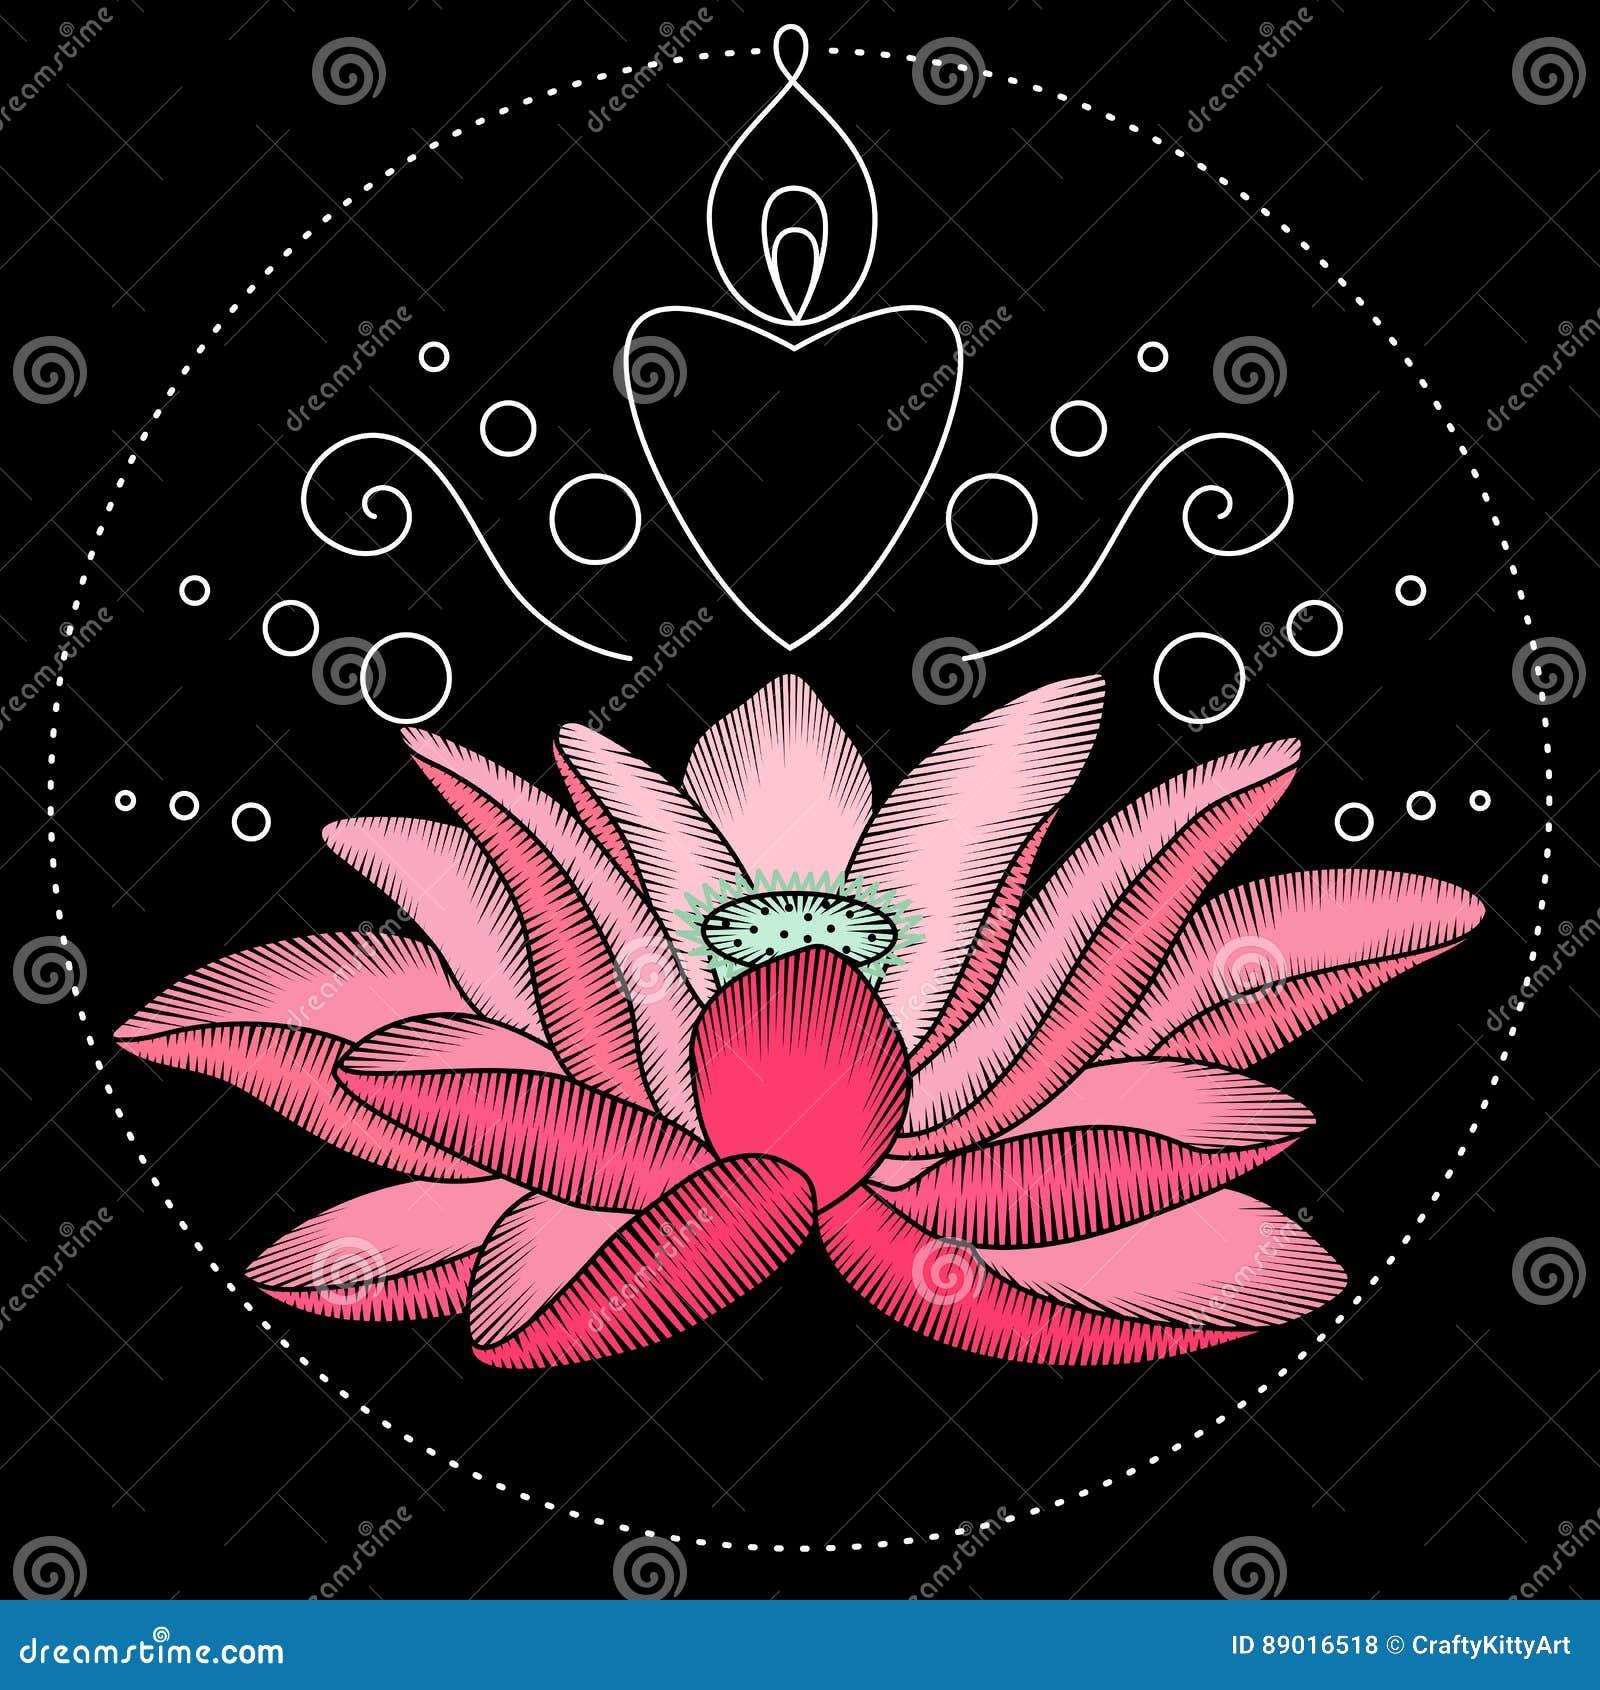 Embroidery lotus fabric design stock vector illustration of ethnic download embroidery lotus fabric design stock vector illustration of ethnic illustration 89016518 izmirmasajfo